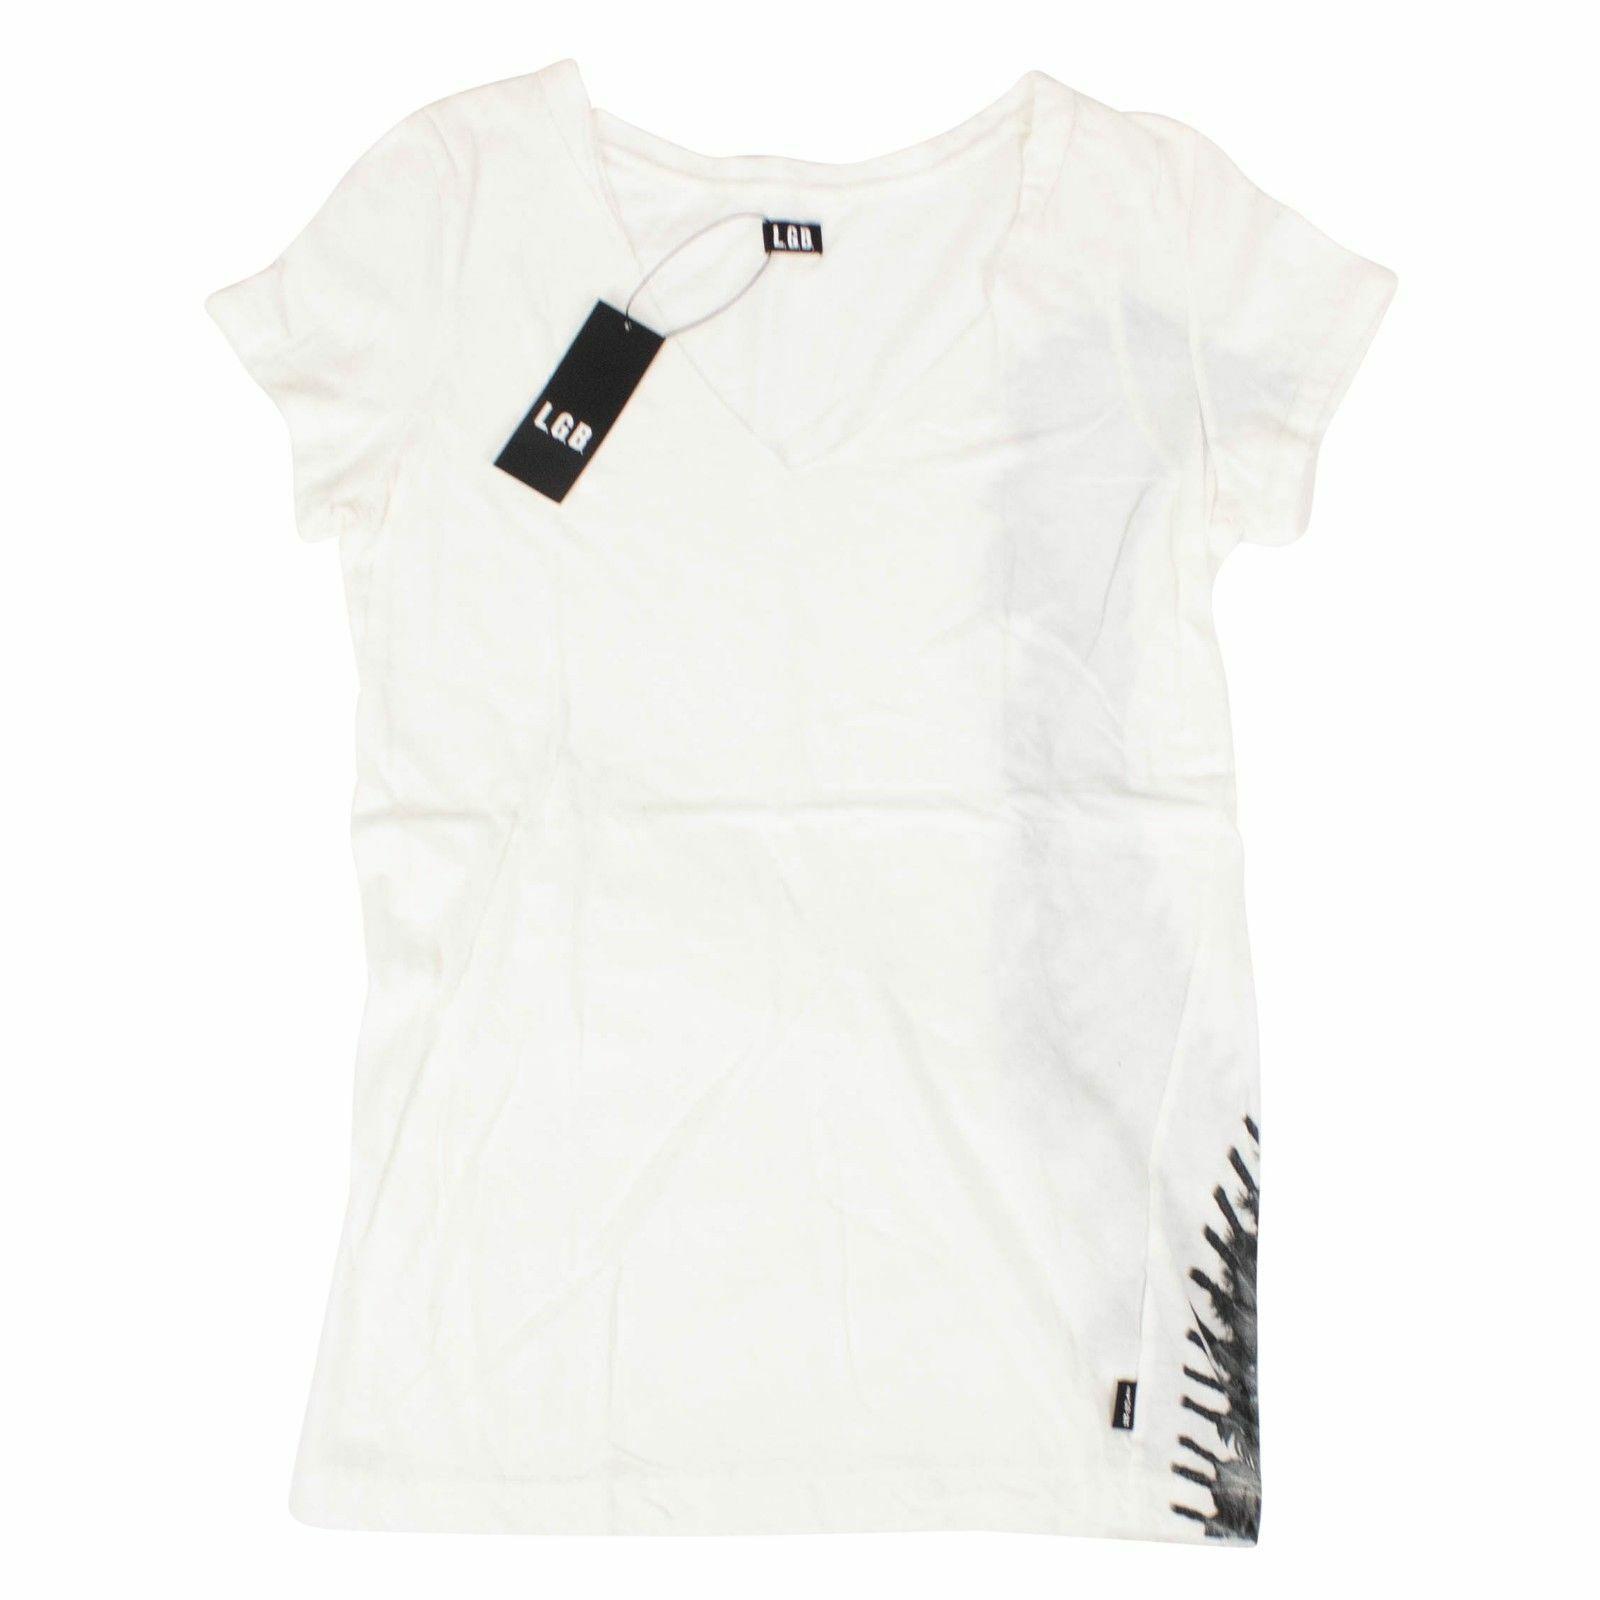 NWT L.G.B. Weiß 'Head Dress' Short Sleeve T-hemd Größe 1 XS  215